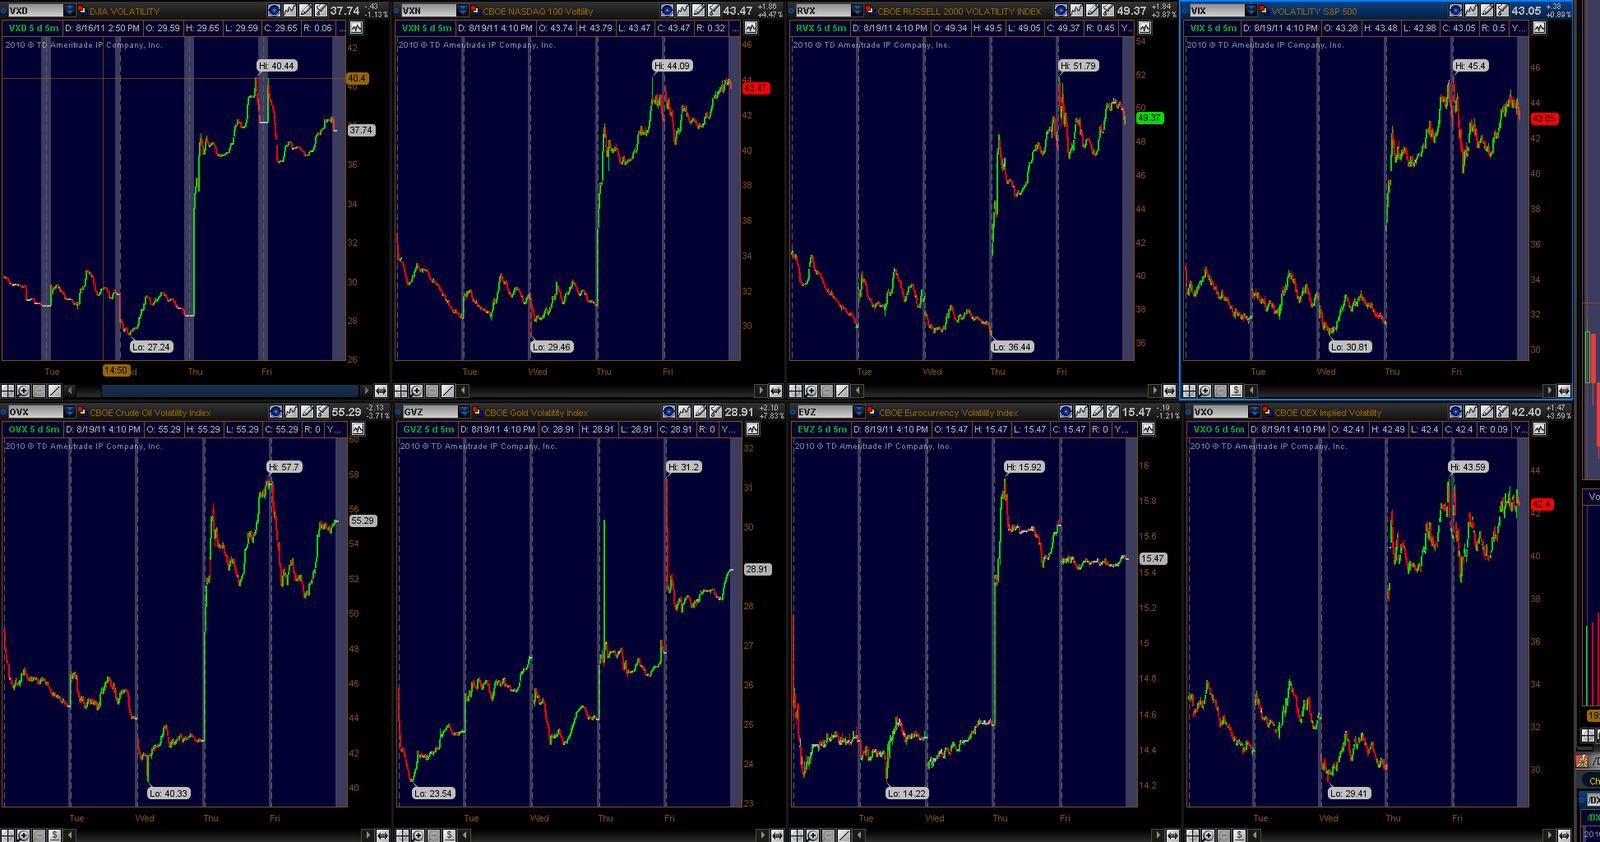 Volatility index option trading